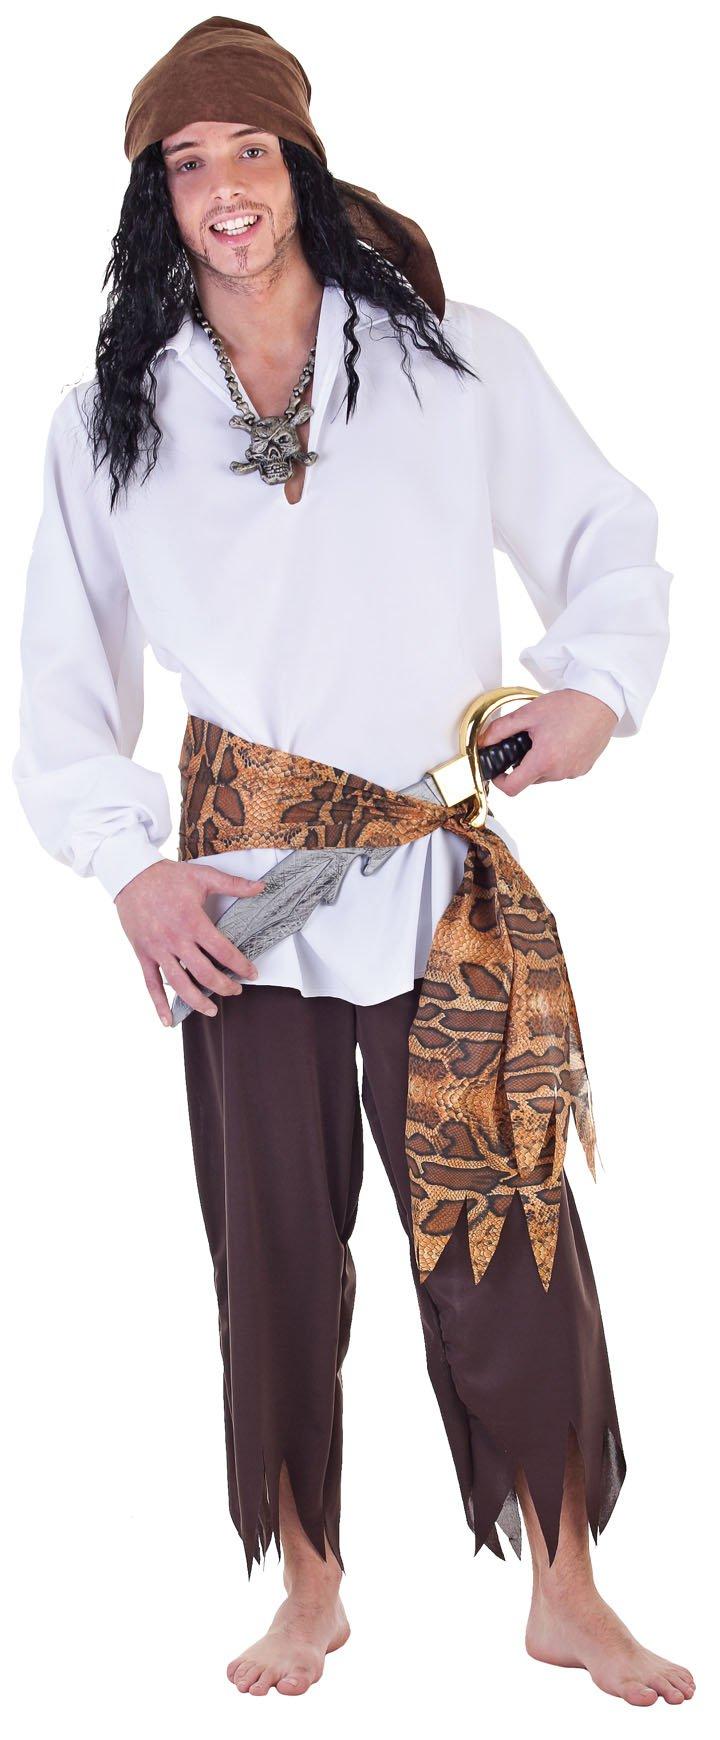 Disfraz de pirata hombre - Imagui